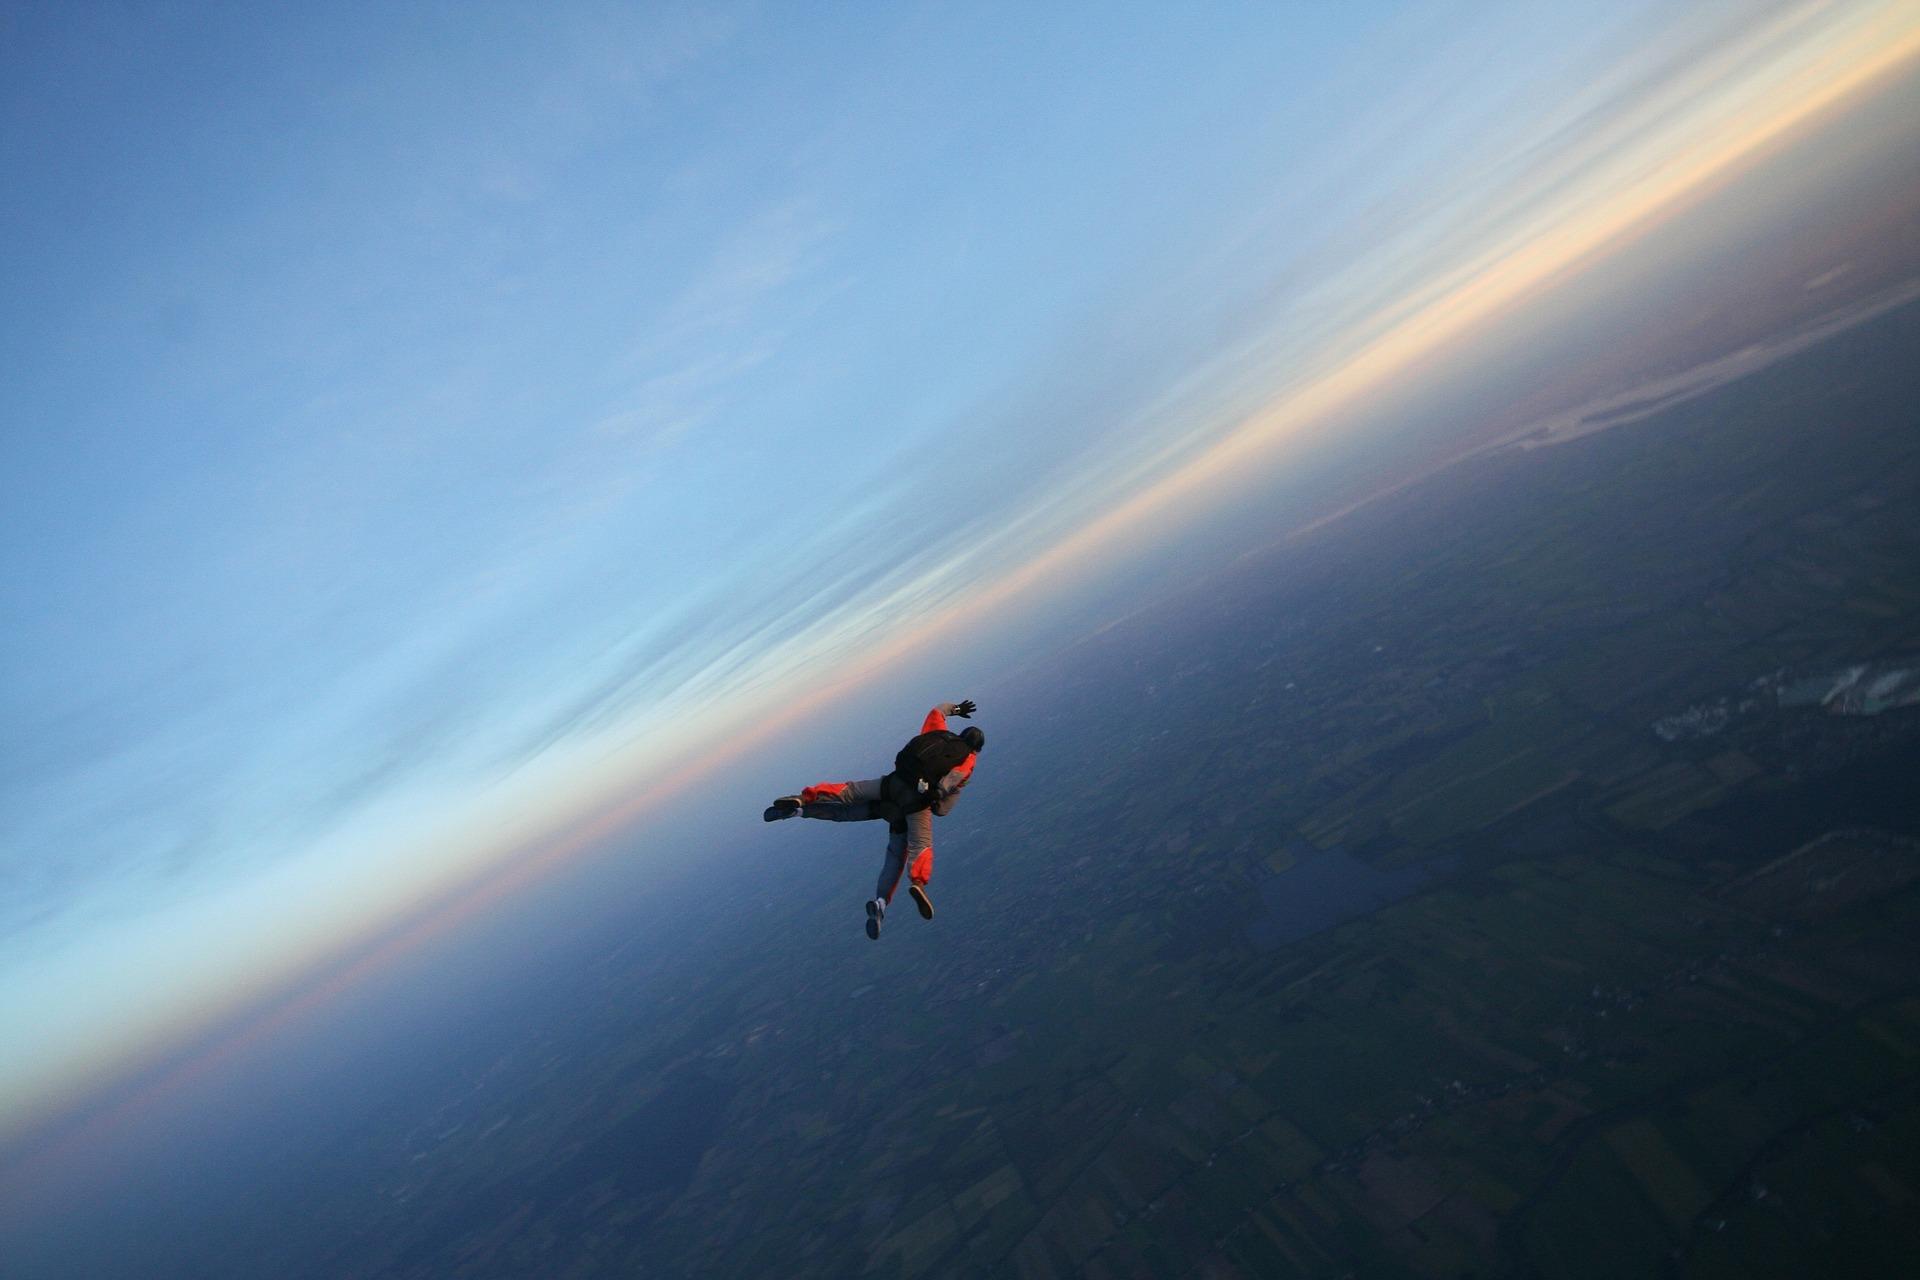 Fallschirm Tandemsprung in Wallerfangen im Saarland ab 219,00€